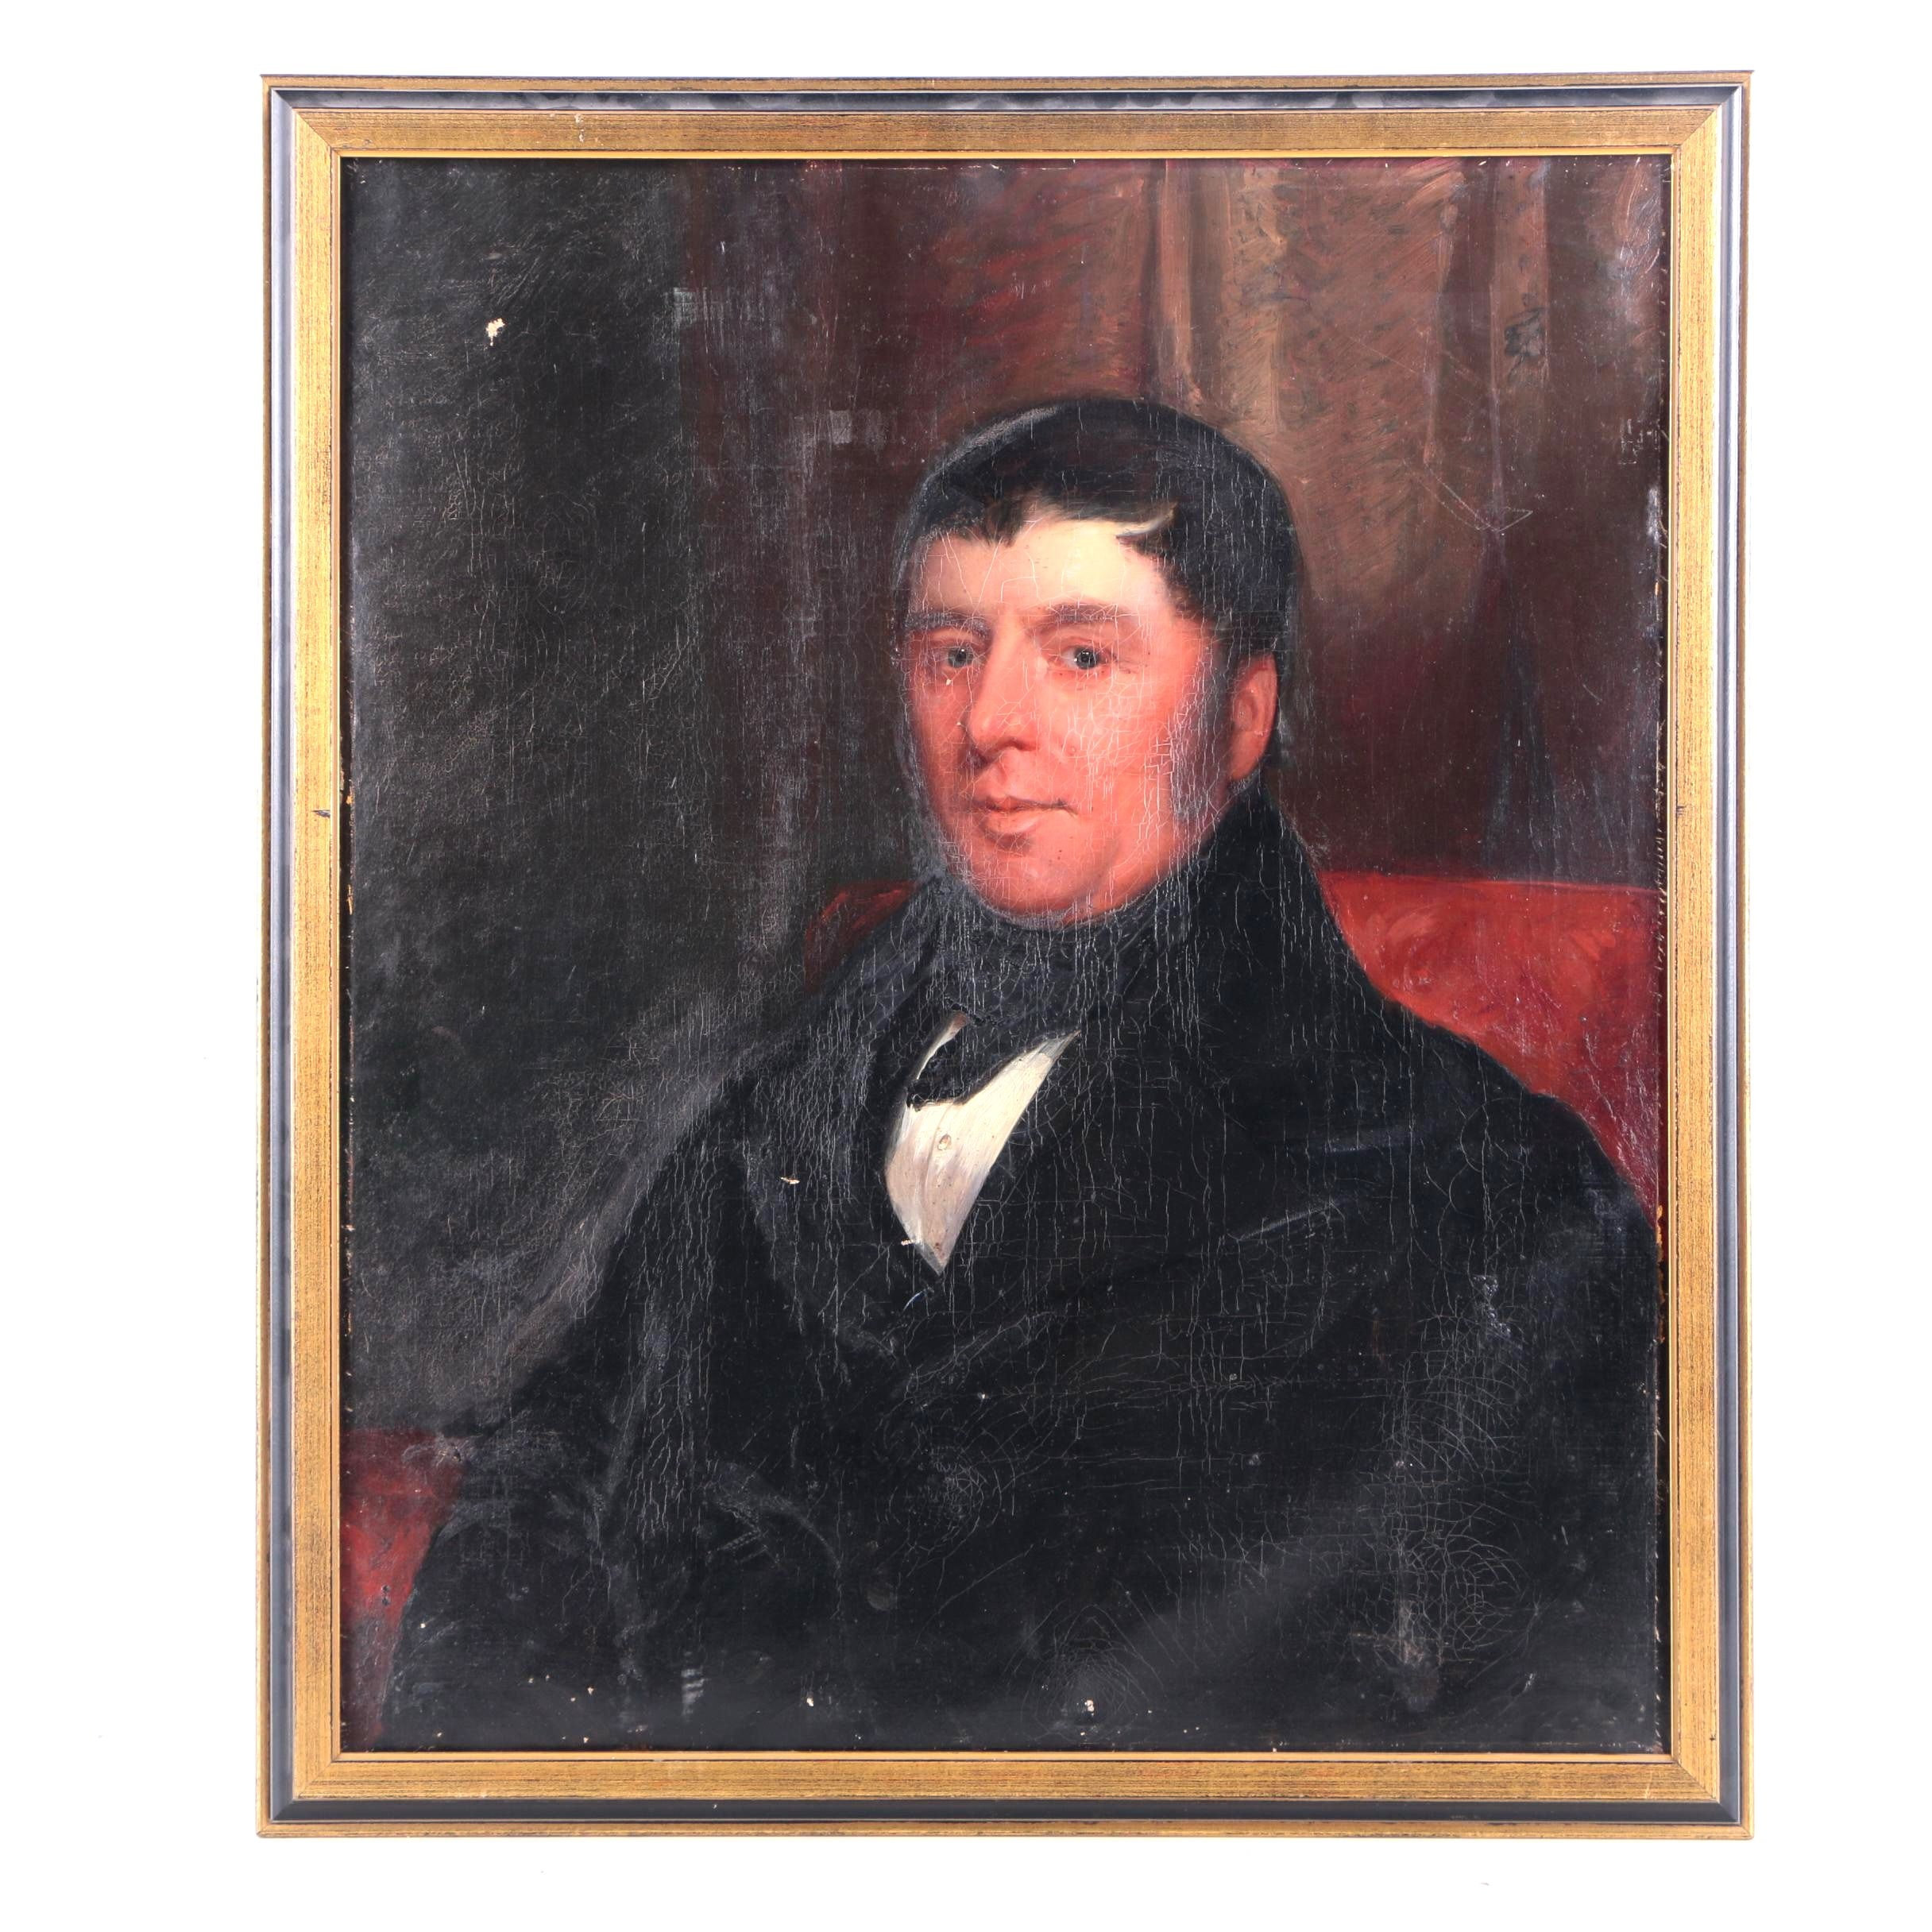 Wm. Poole Sheffield Oil Portrait of Joseph Shepperson